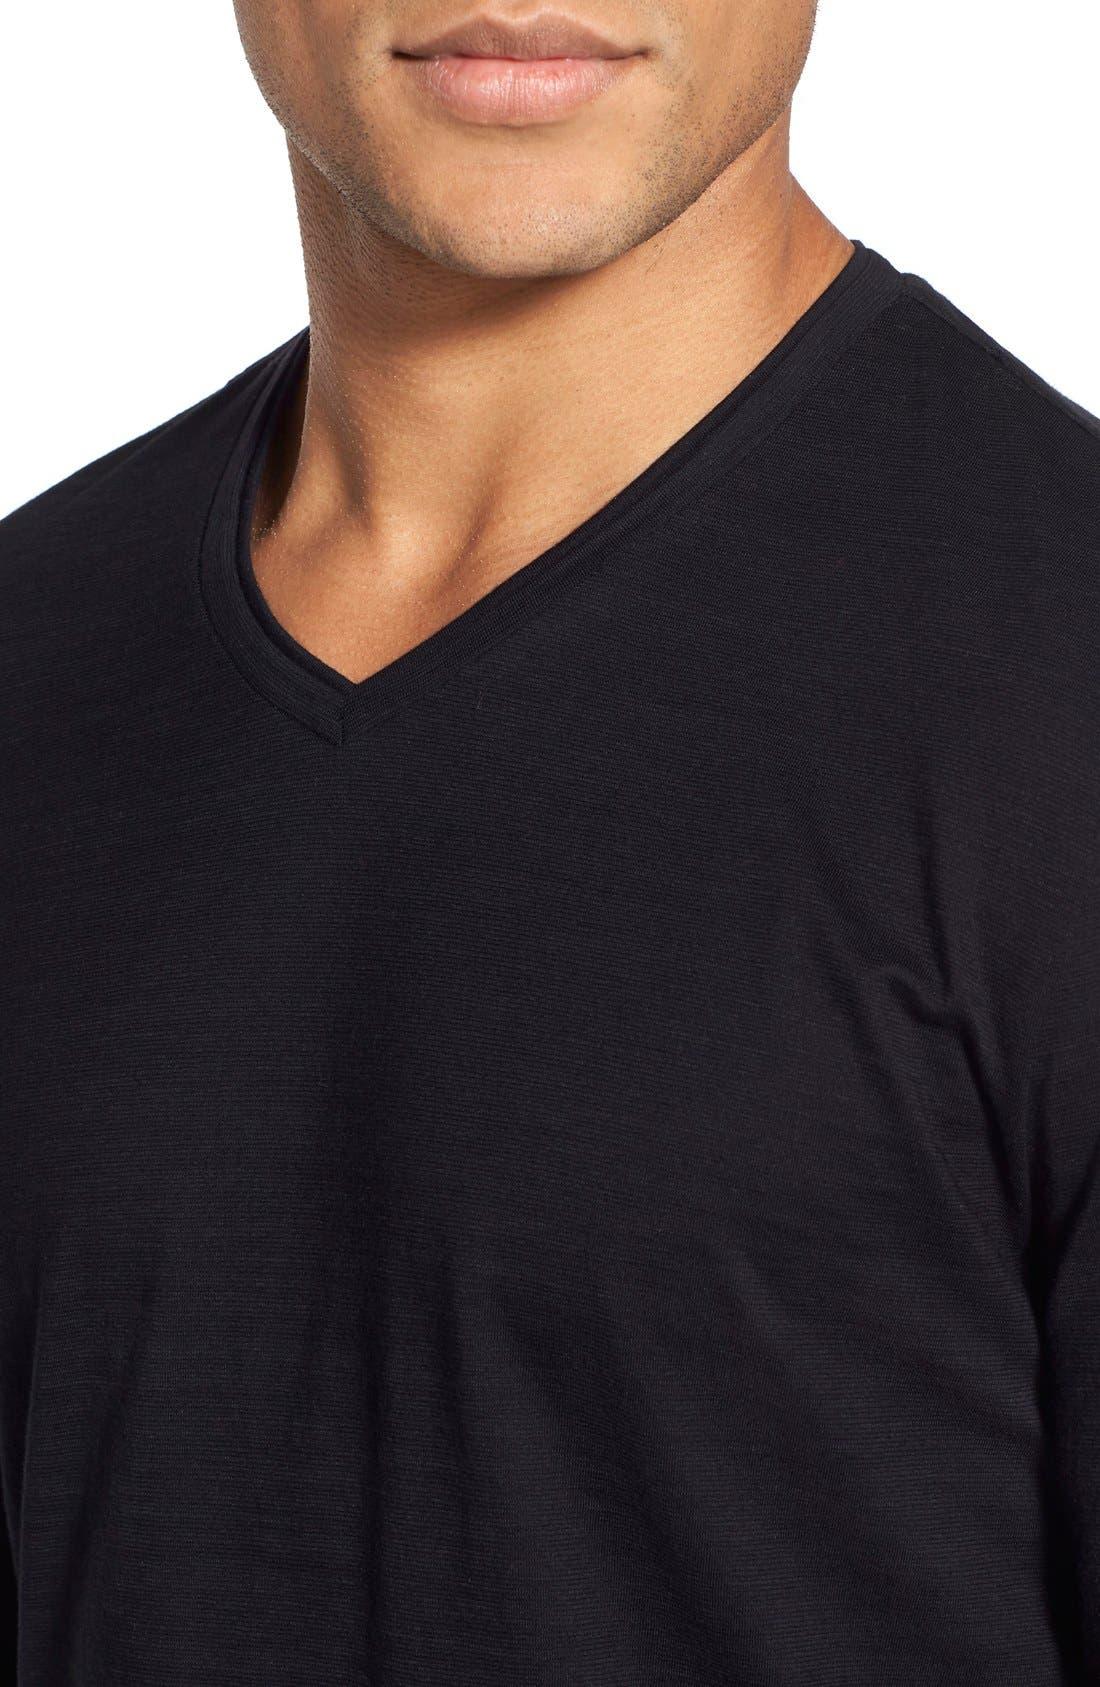 'Tyson' V-Neck Long Sleeve T-Shirt,                             Alternate thumbnail 4, color,                             Black